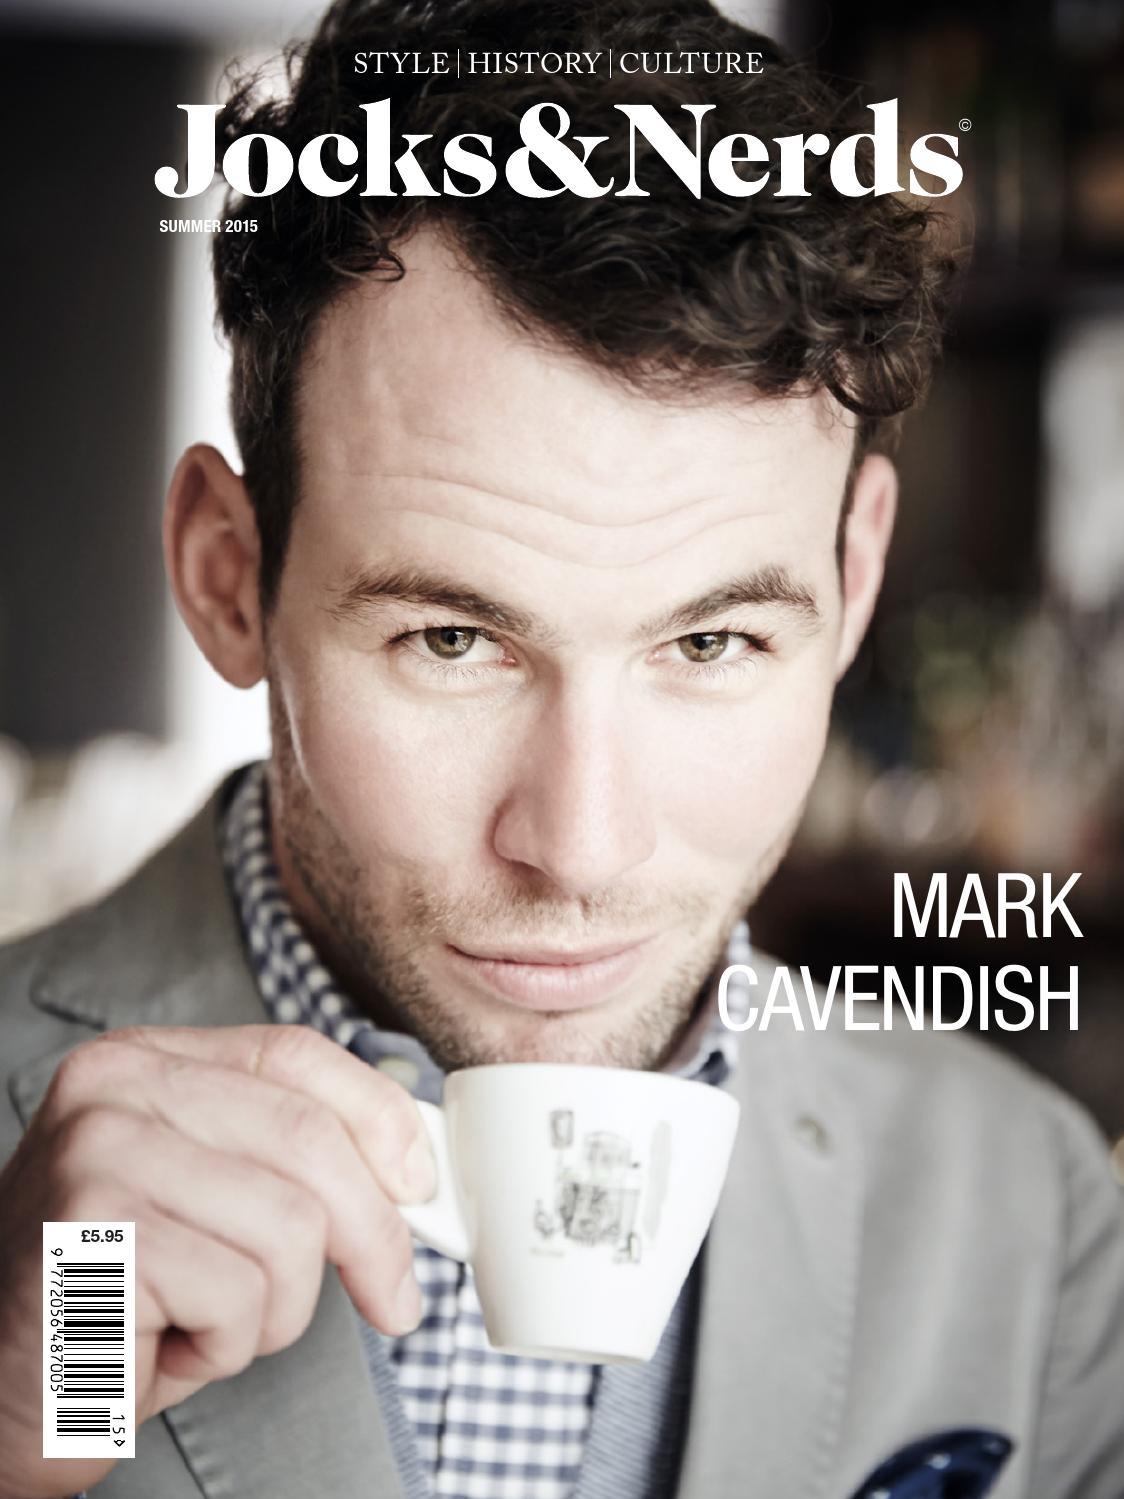 Jocks&Nerds Issue 15, Summer 2015 by Jocks&Nerds Magazine - issuu